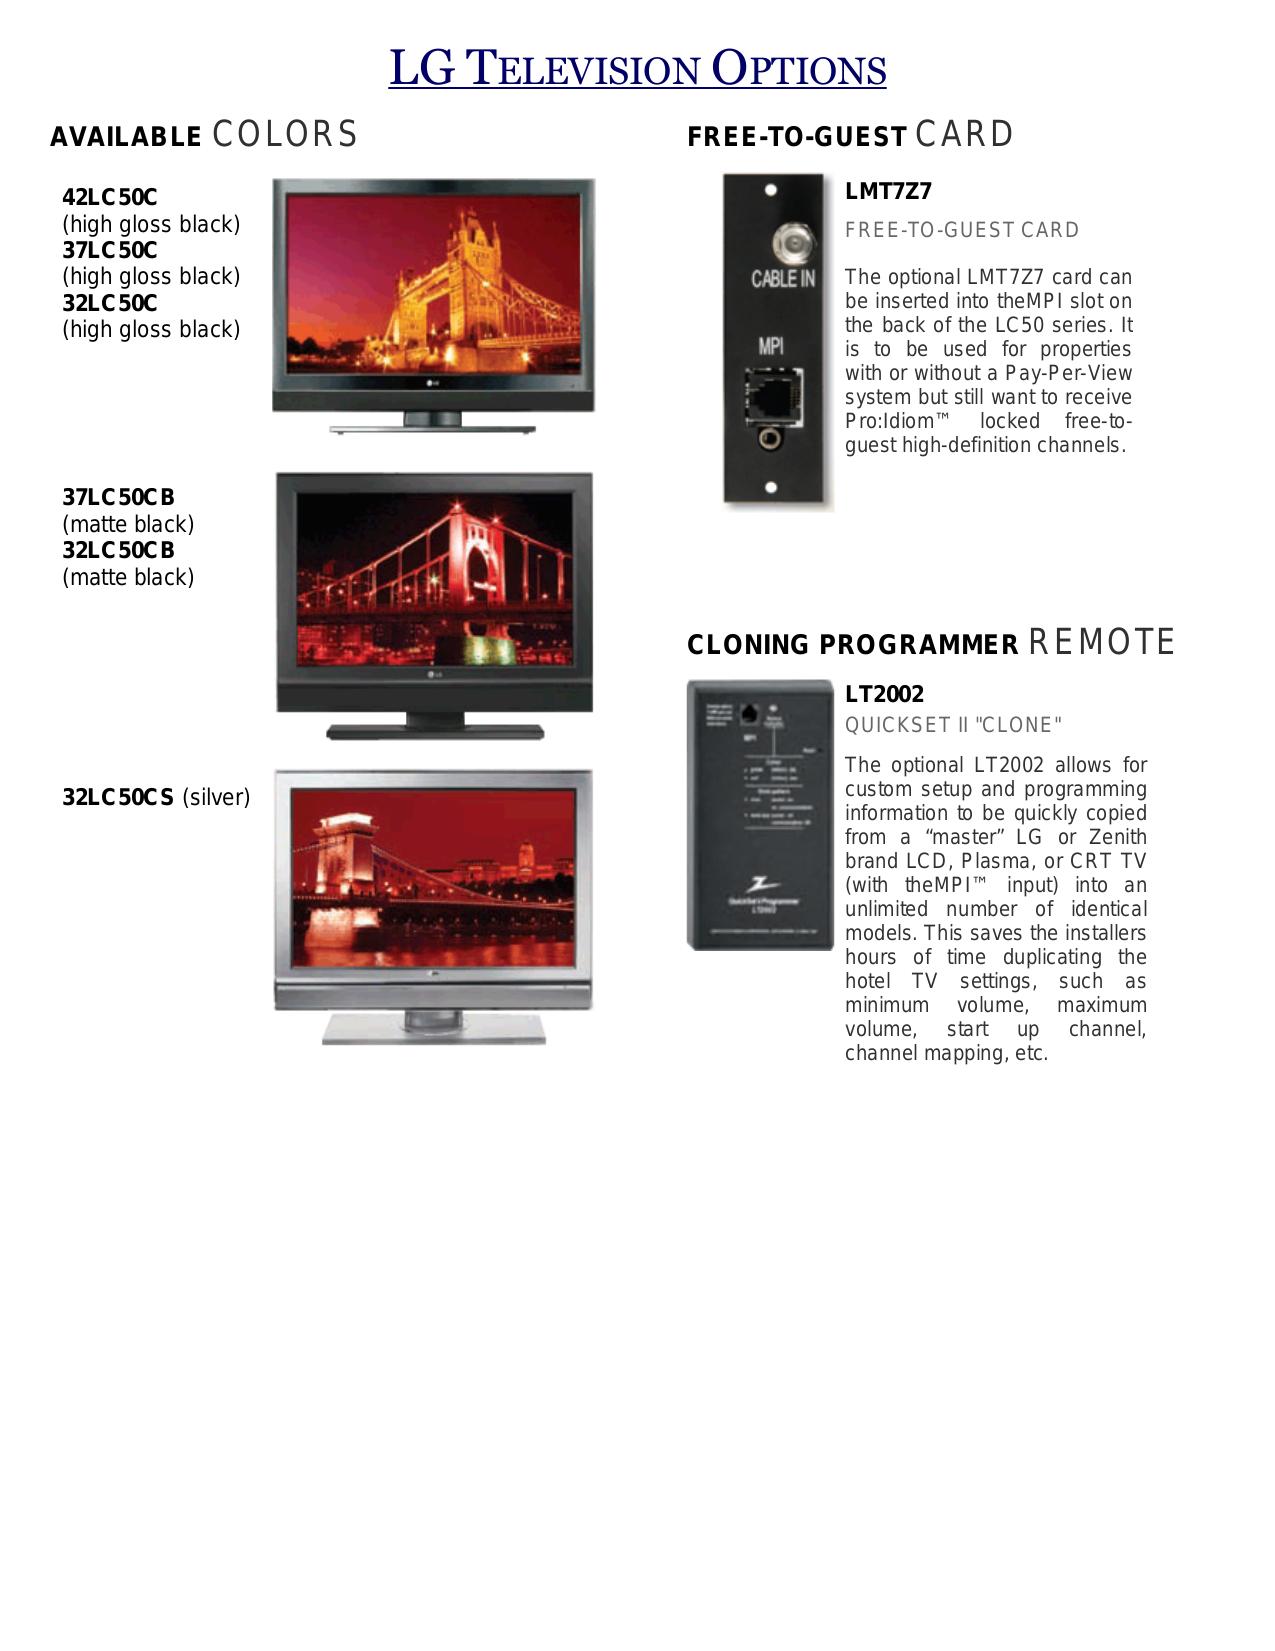 PDF manual for LG TV 37LC50CB